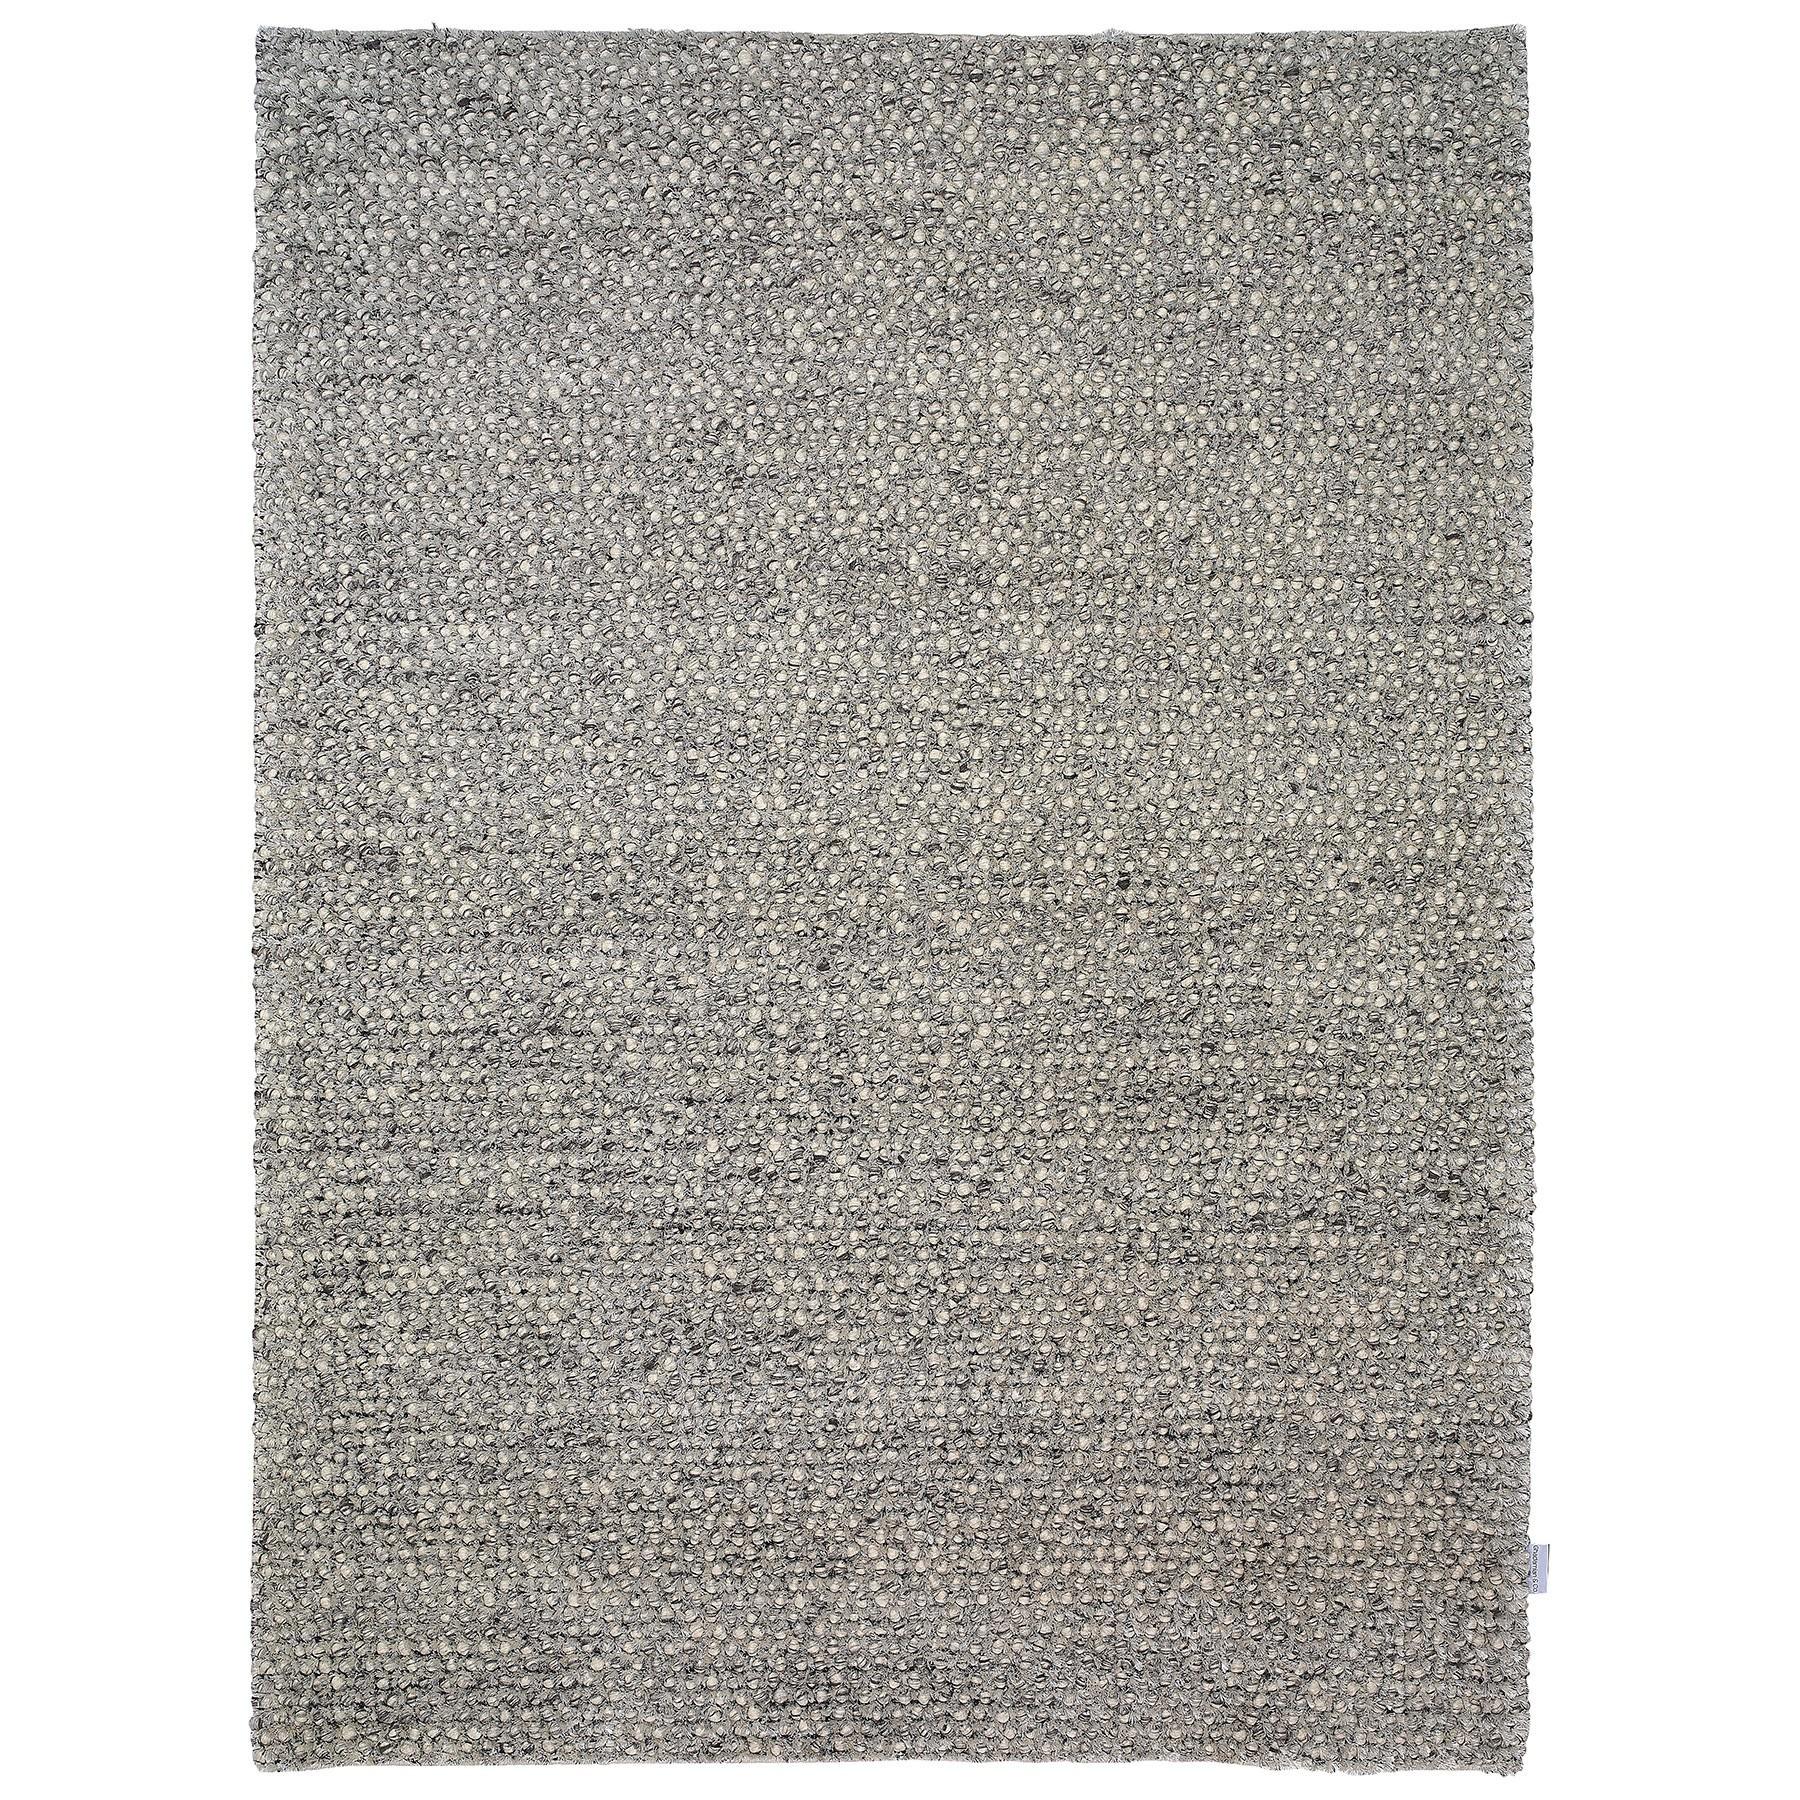 Soho Handwoven Wool Shag Rug, 330x240cm